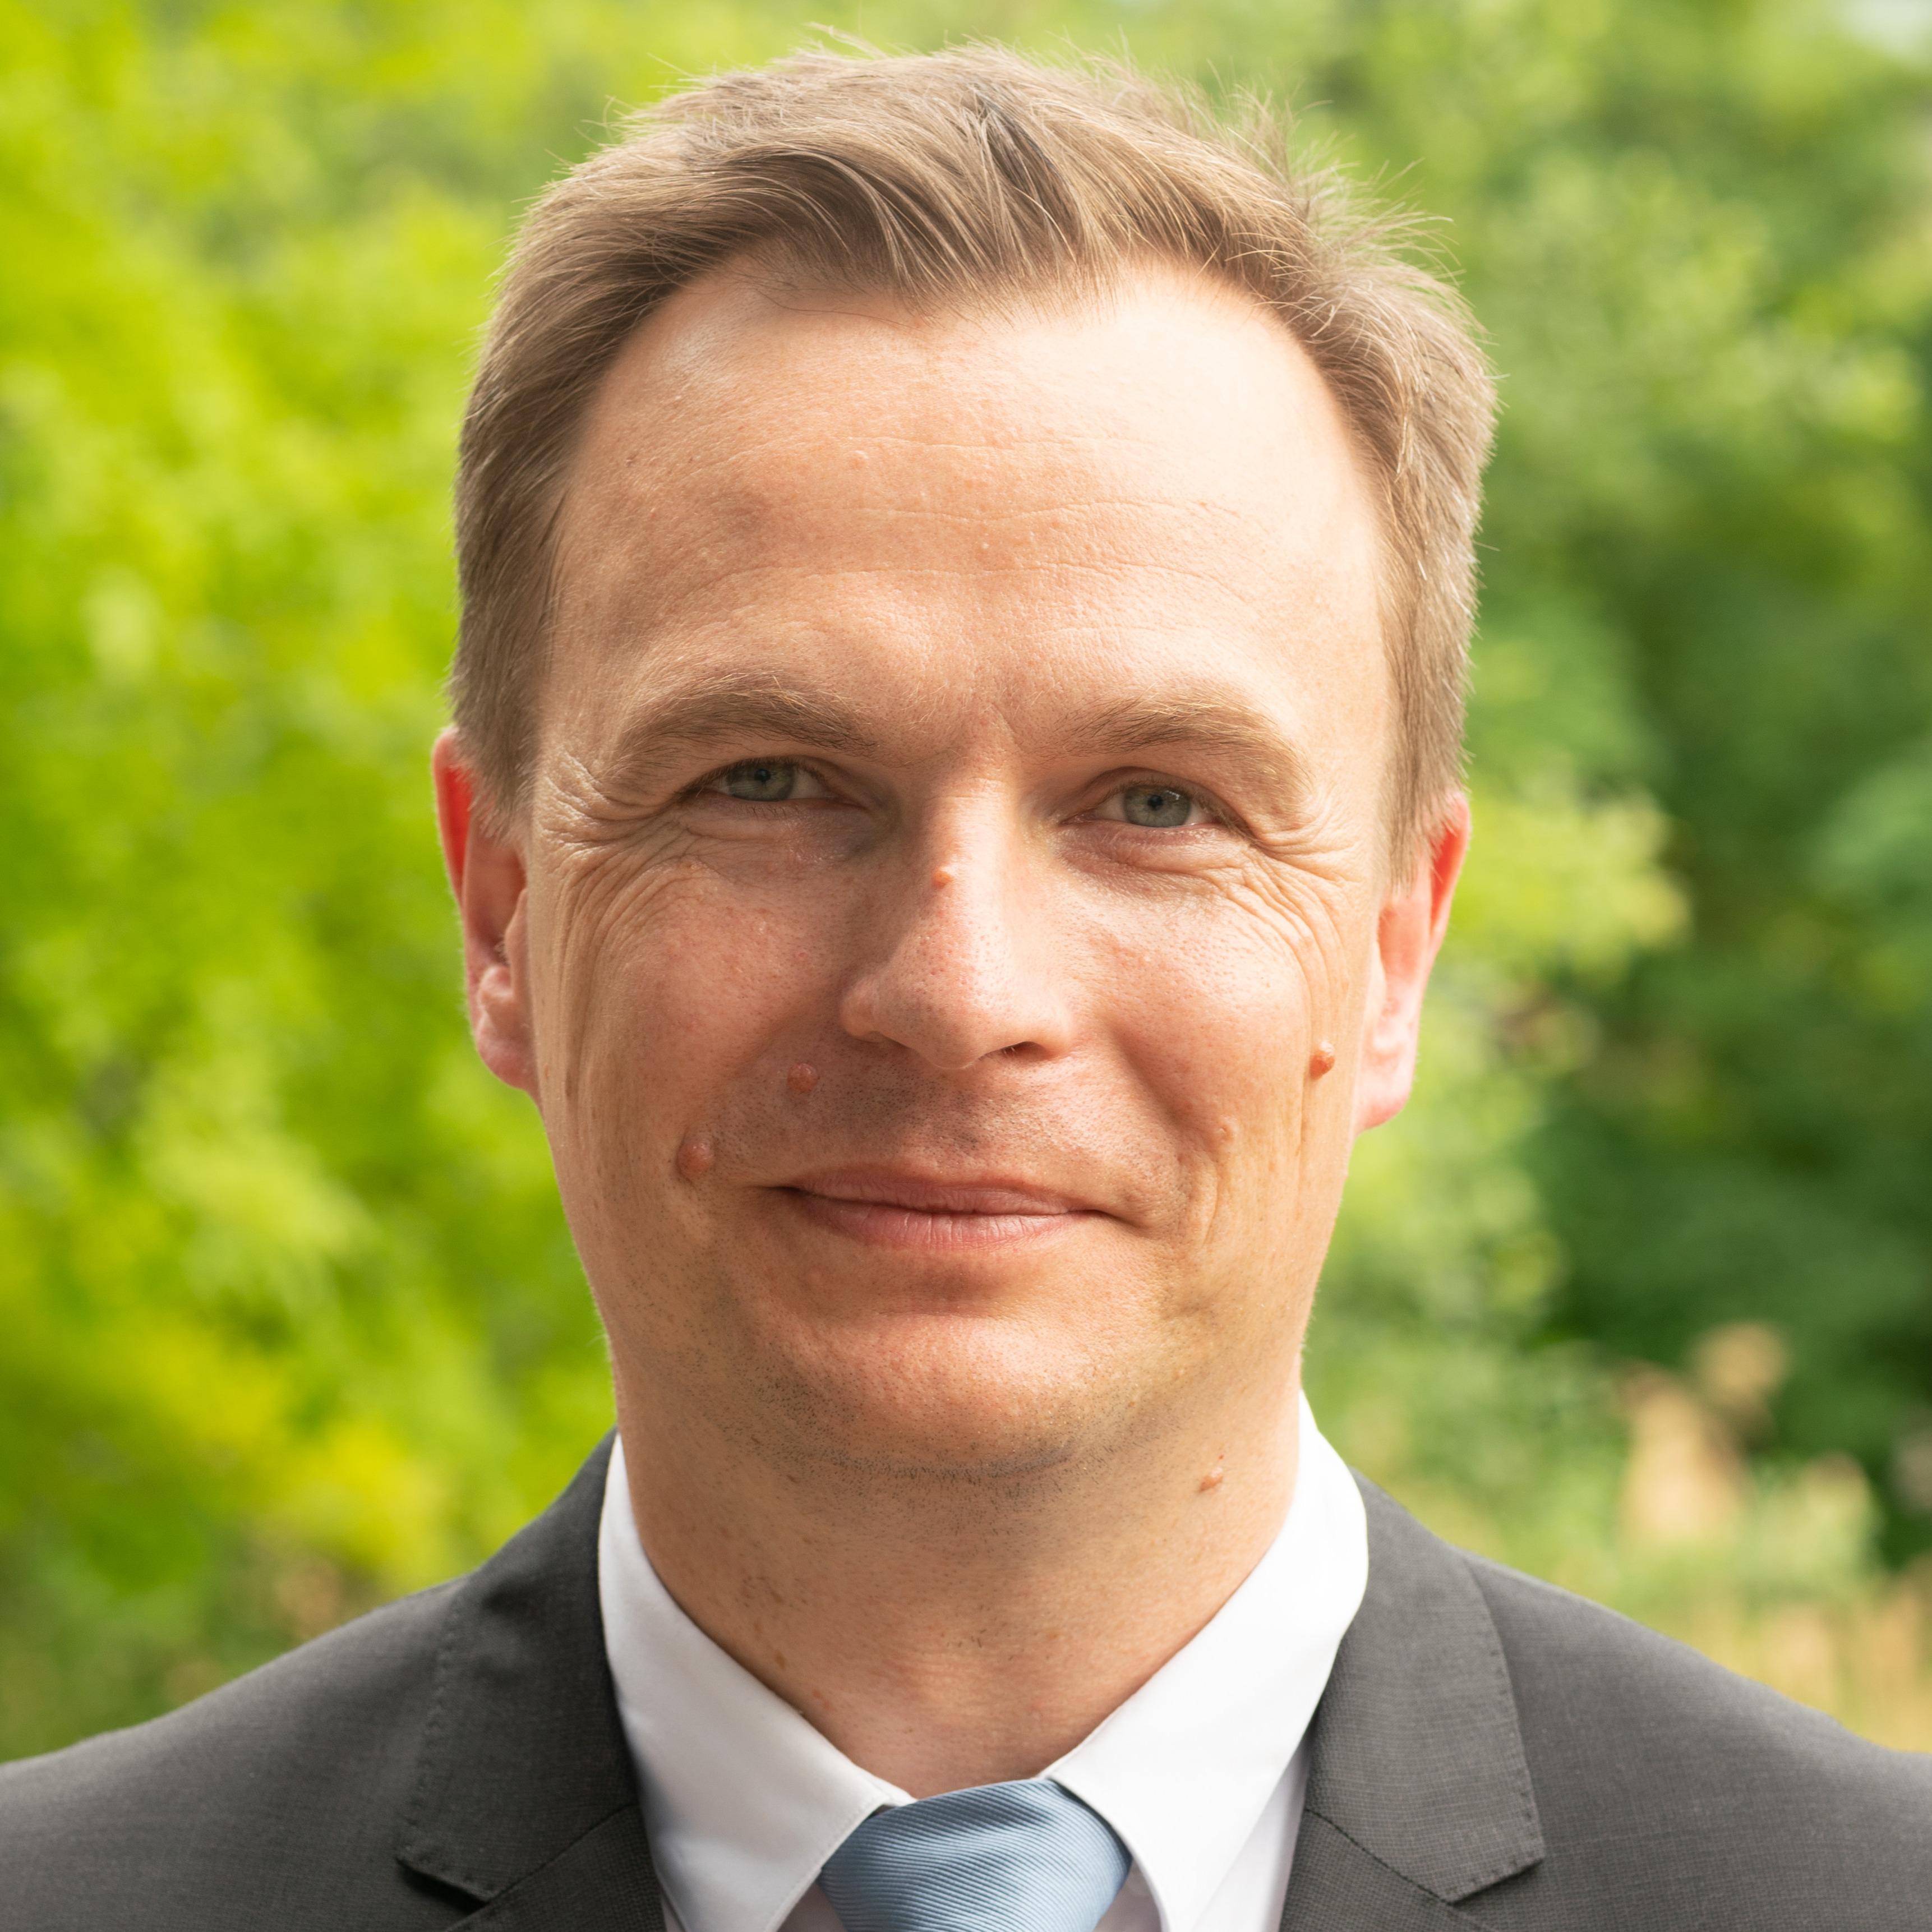 Jens Suedekum